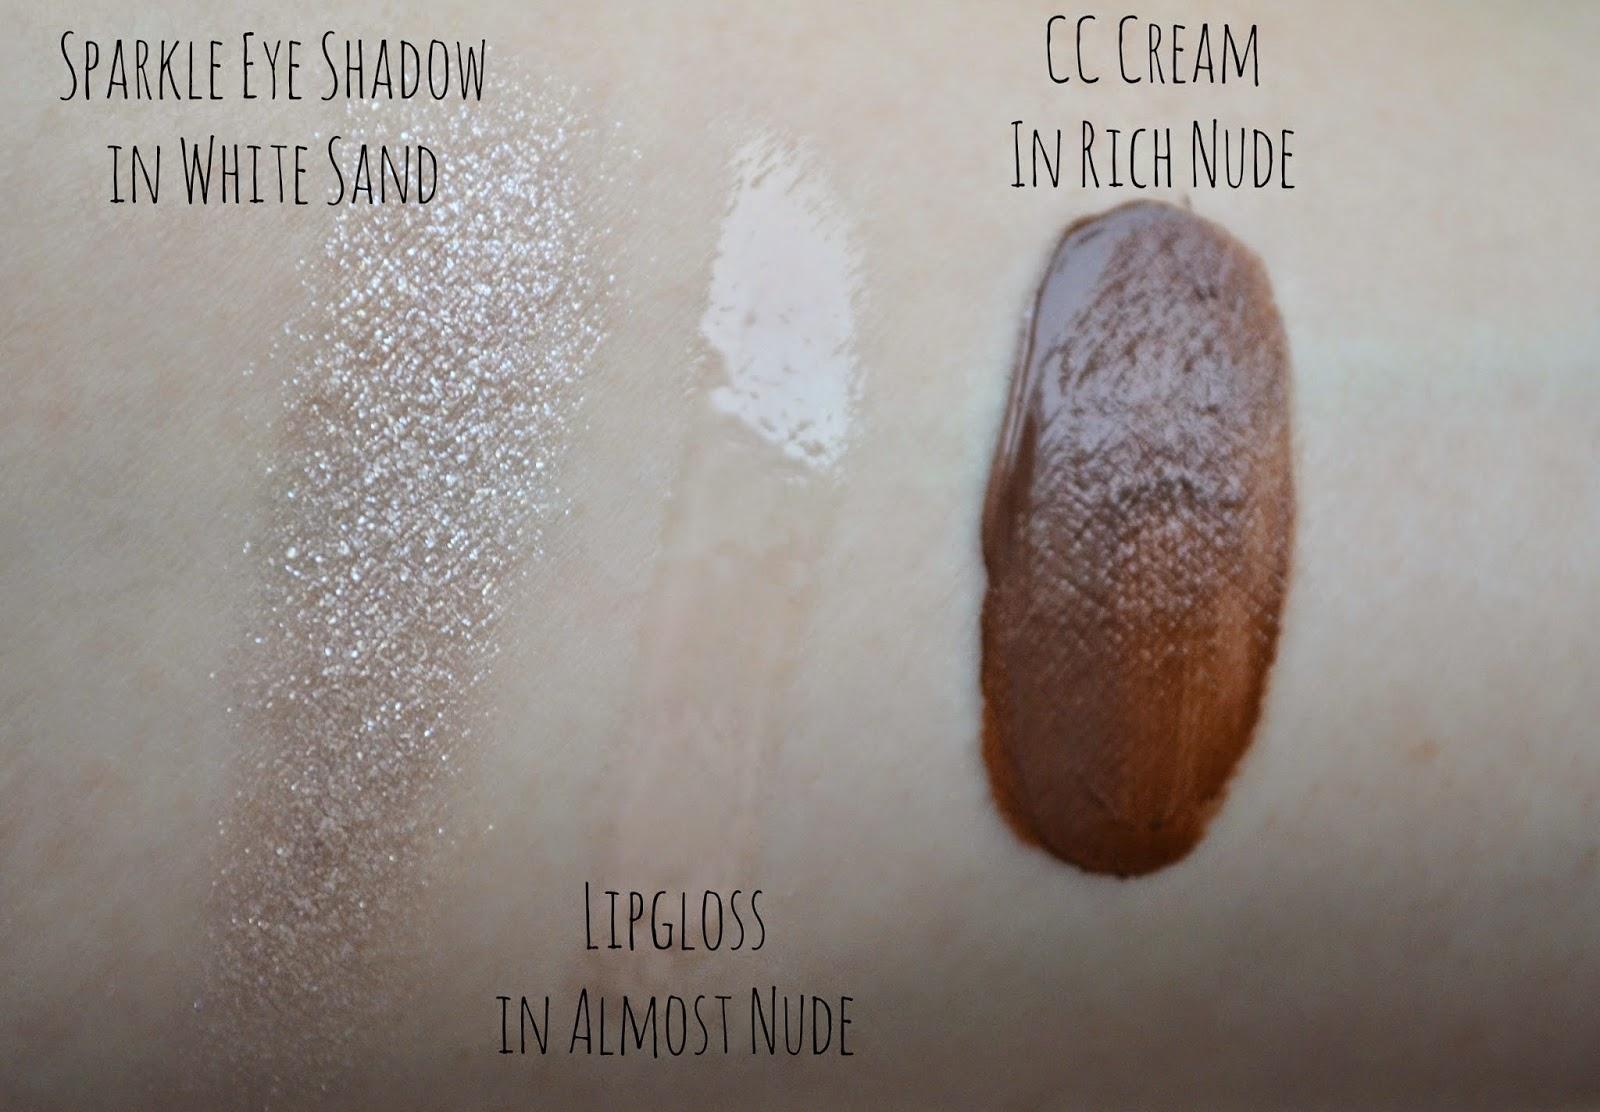 Almost nude bobbi brown